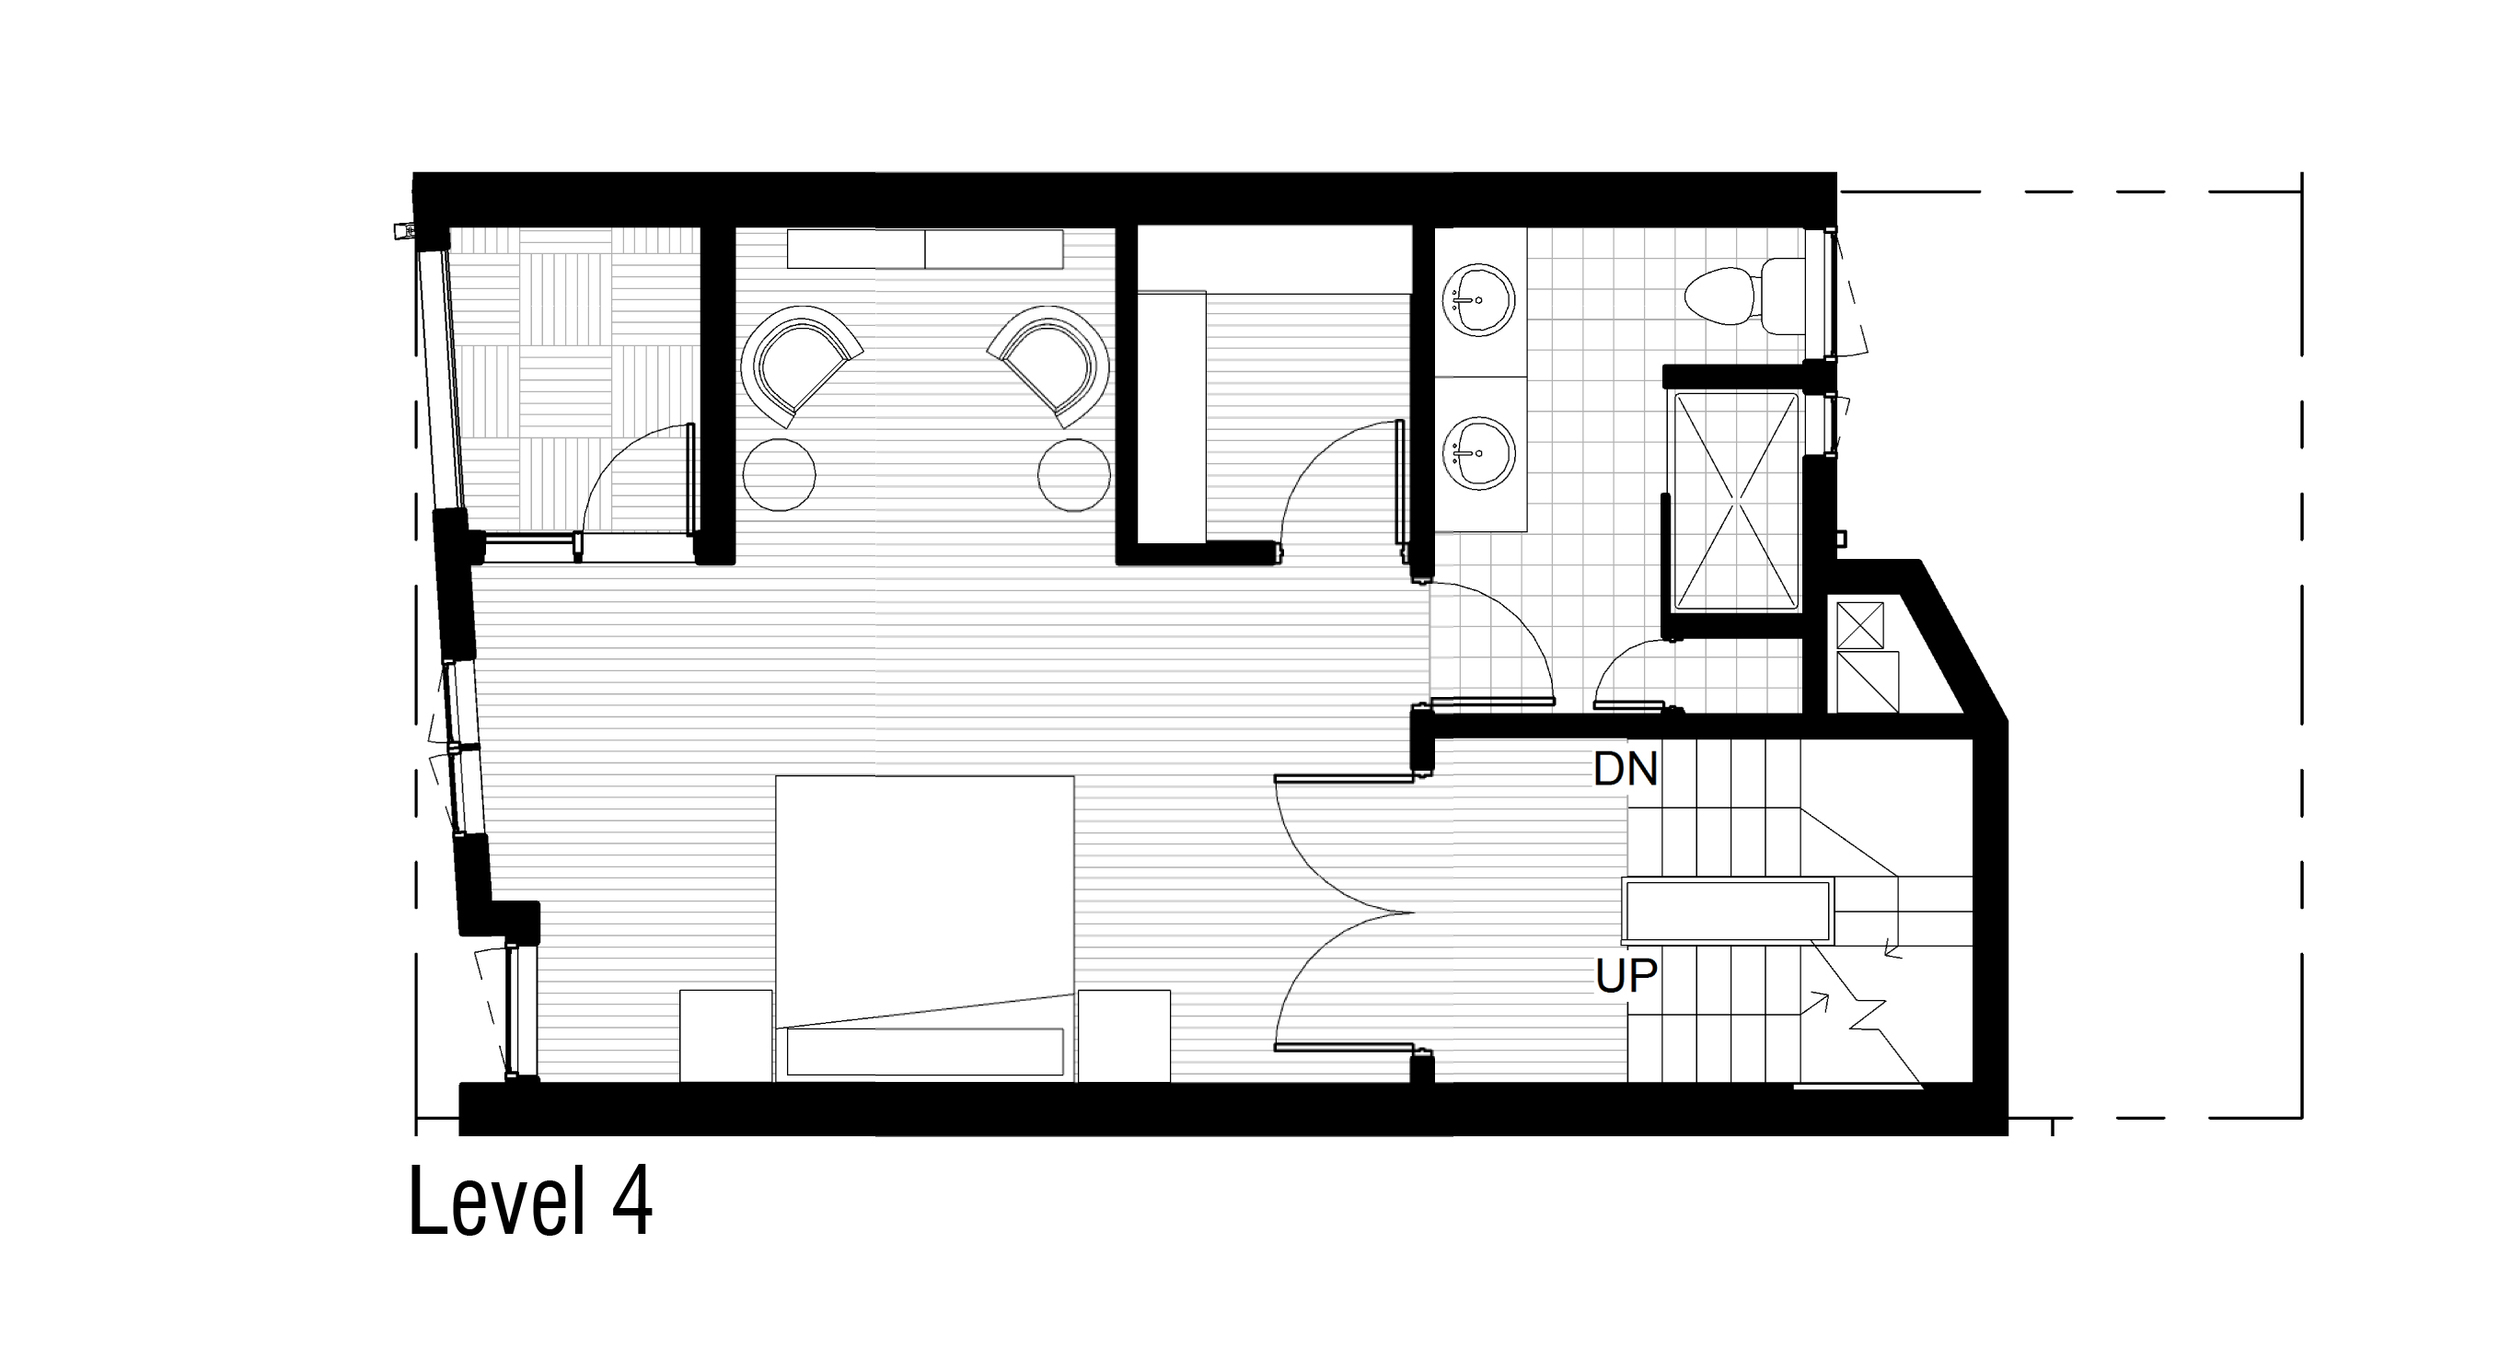 12001_834N4St_Townhouse_Plan04.jpg